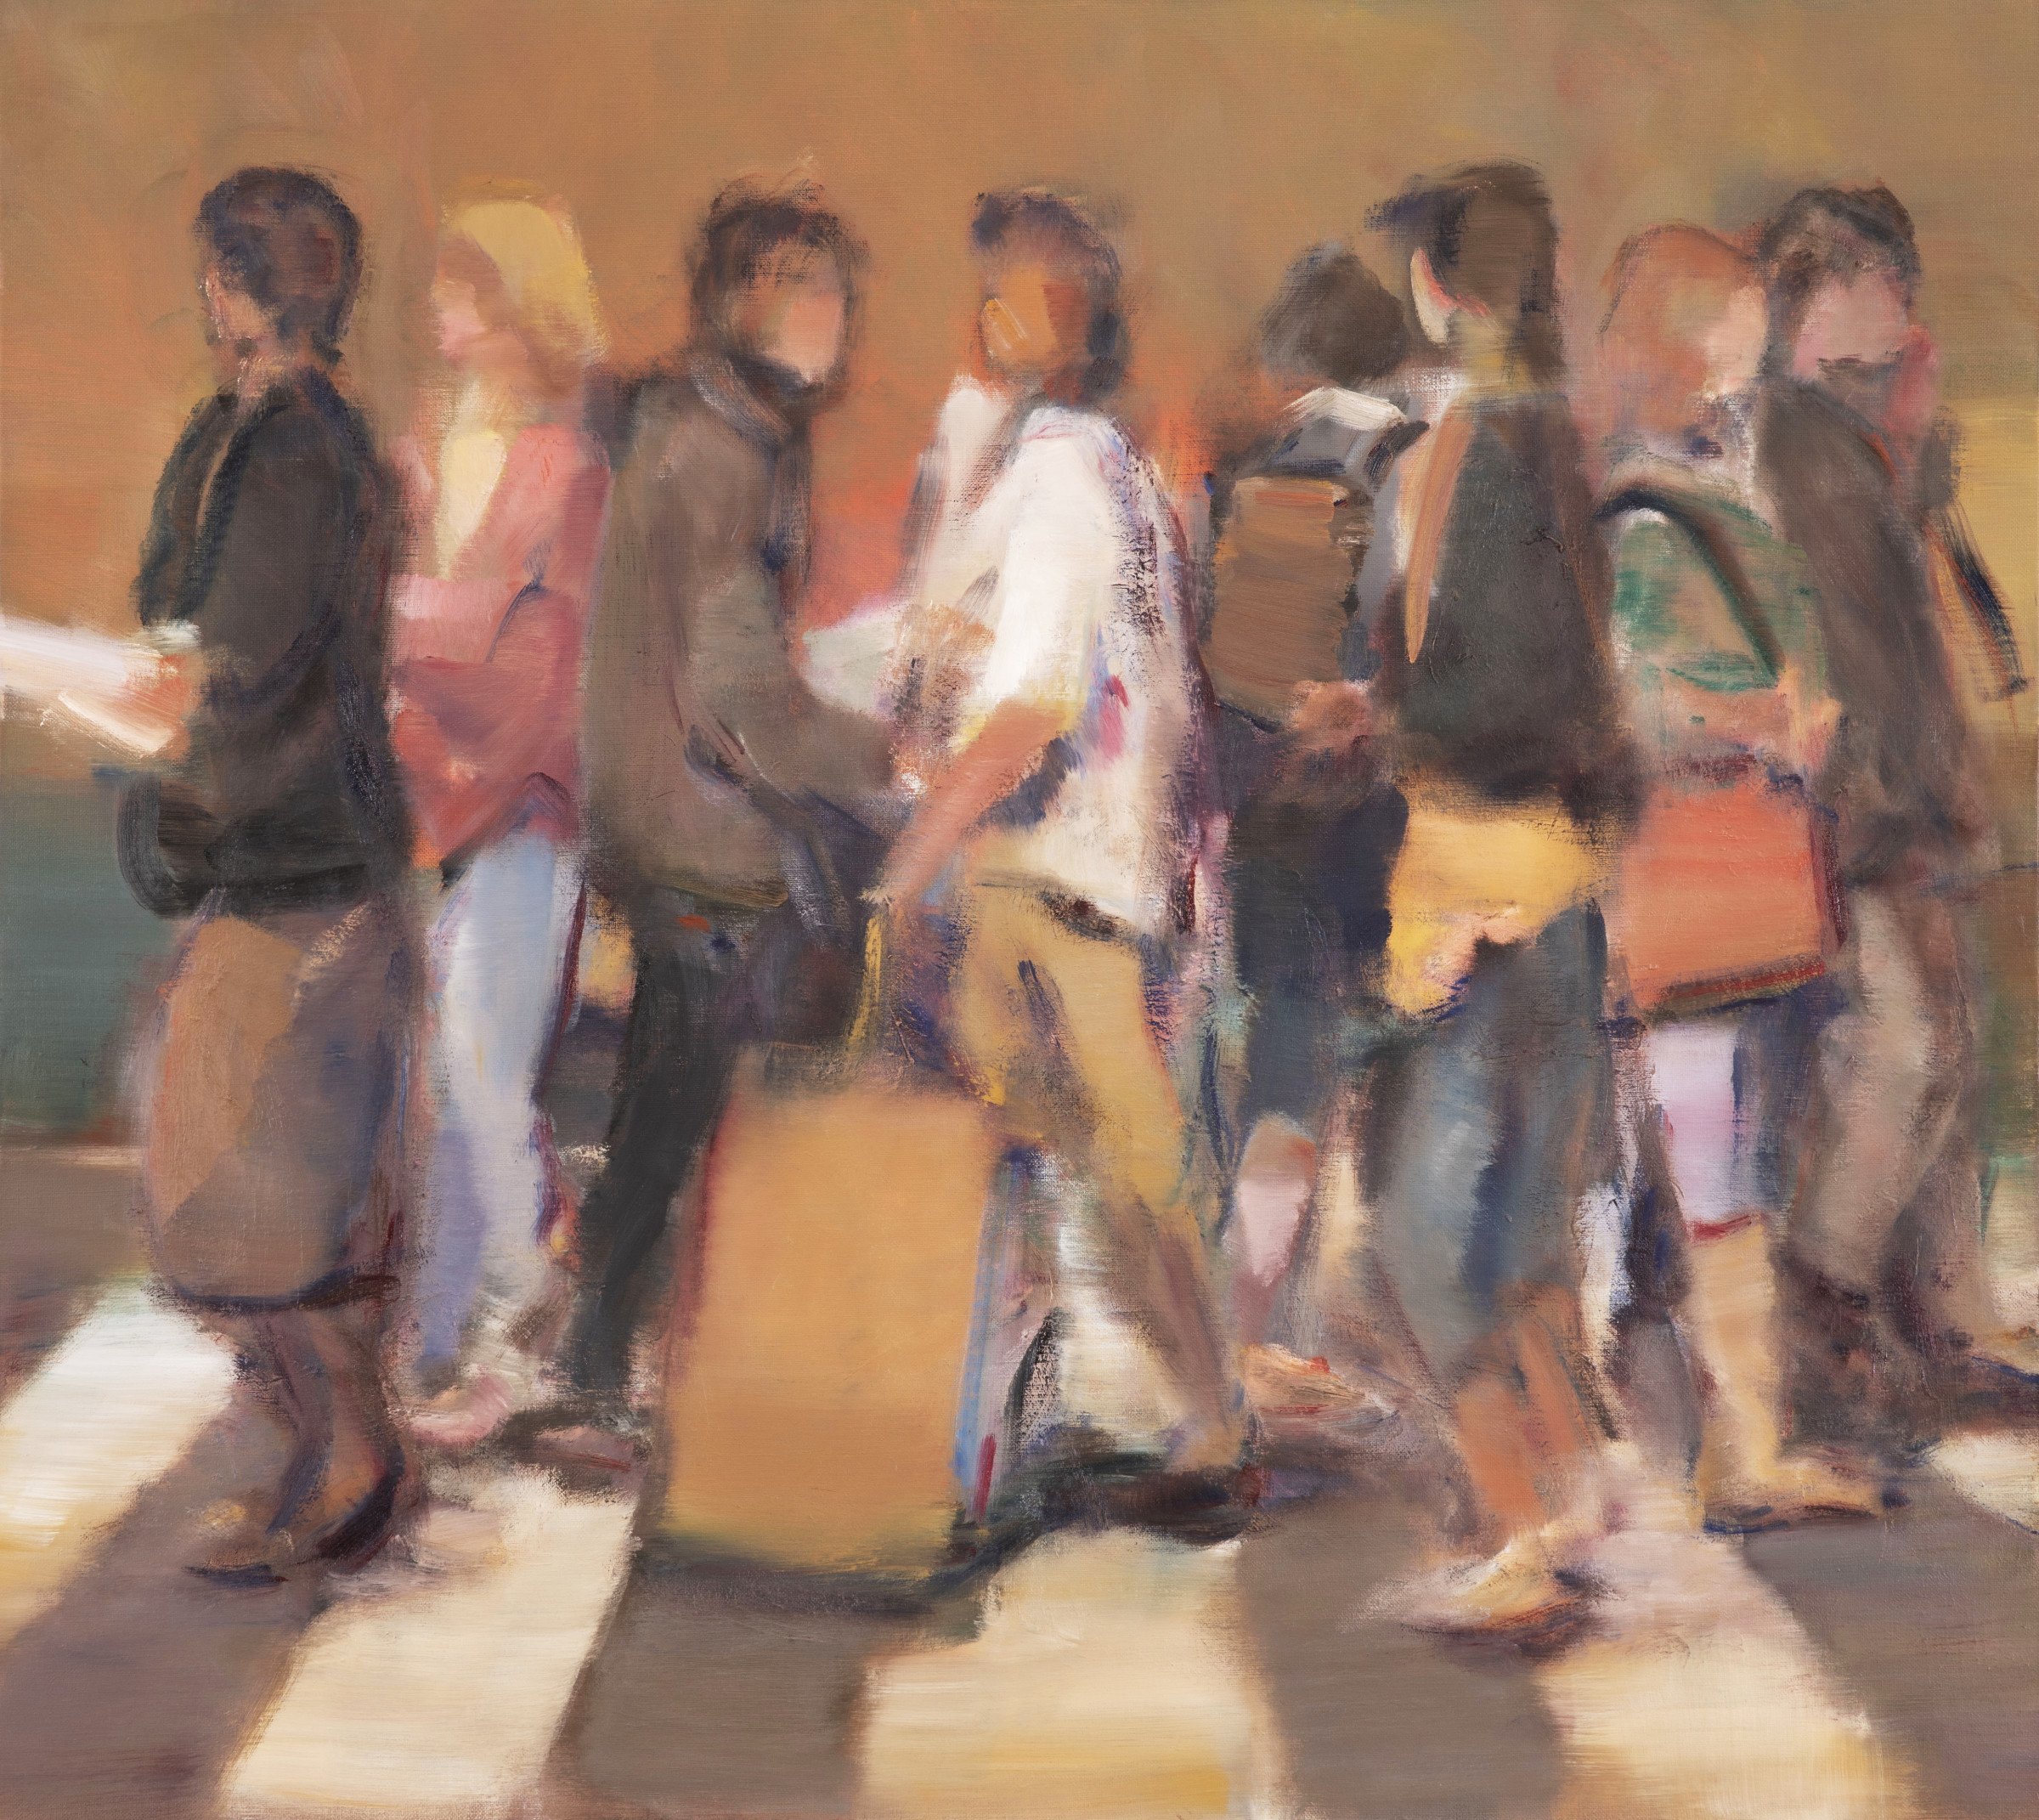 "<span class=""link fancybox-details-link""><a href=""/artists/59-simon-nicholas/works/506-simon-nicholas-crosswalk-iii/"">View Detail Page</a></span><div class=""artist""><strong>Simon Nicholas</strong></div> <div class=""title""><em>Crosswalk III</em></div> <div class=""medium"">Oil on Linen</div> <div class=""dimensions"">33.5 x 37.5 inches SOLD</div>"